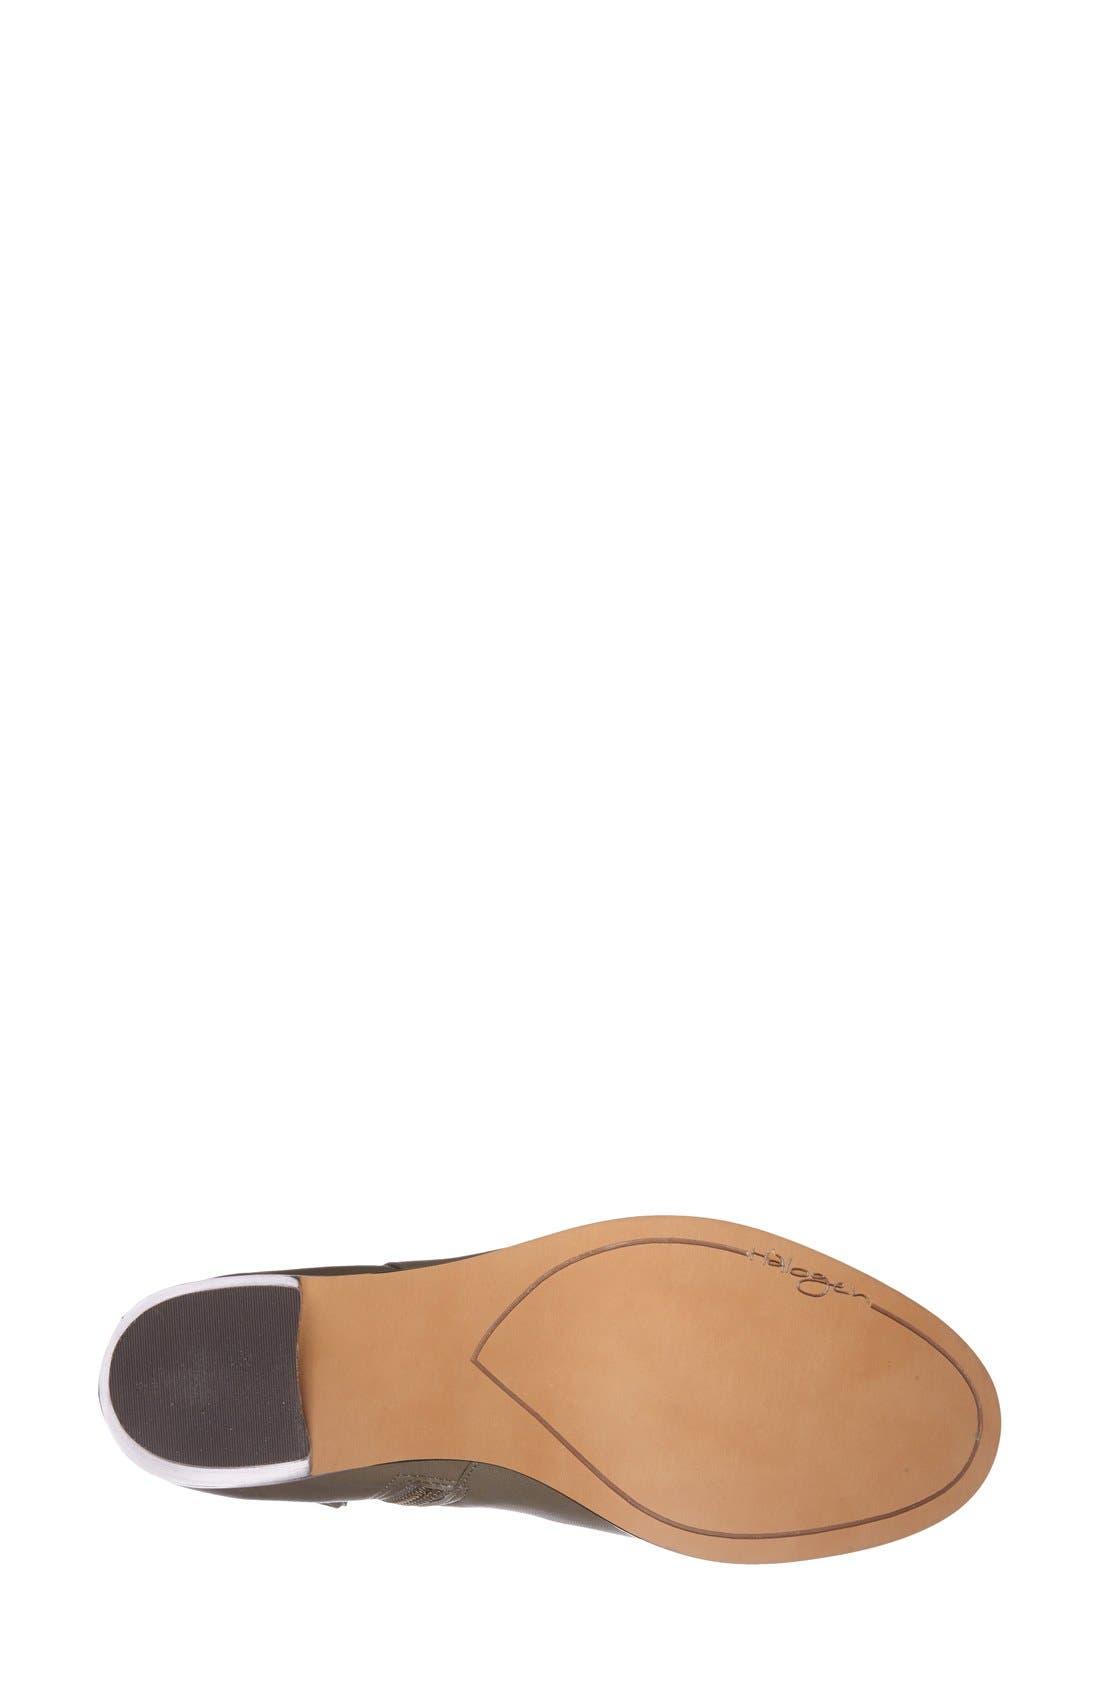 Alternate Image 4  - Halogen® 'Glenna' Leather Ankle Bootie (Women)